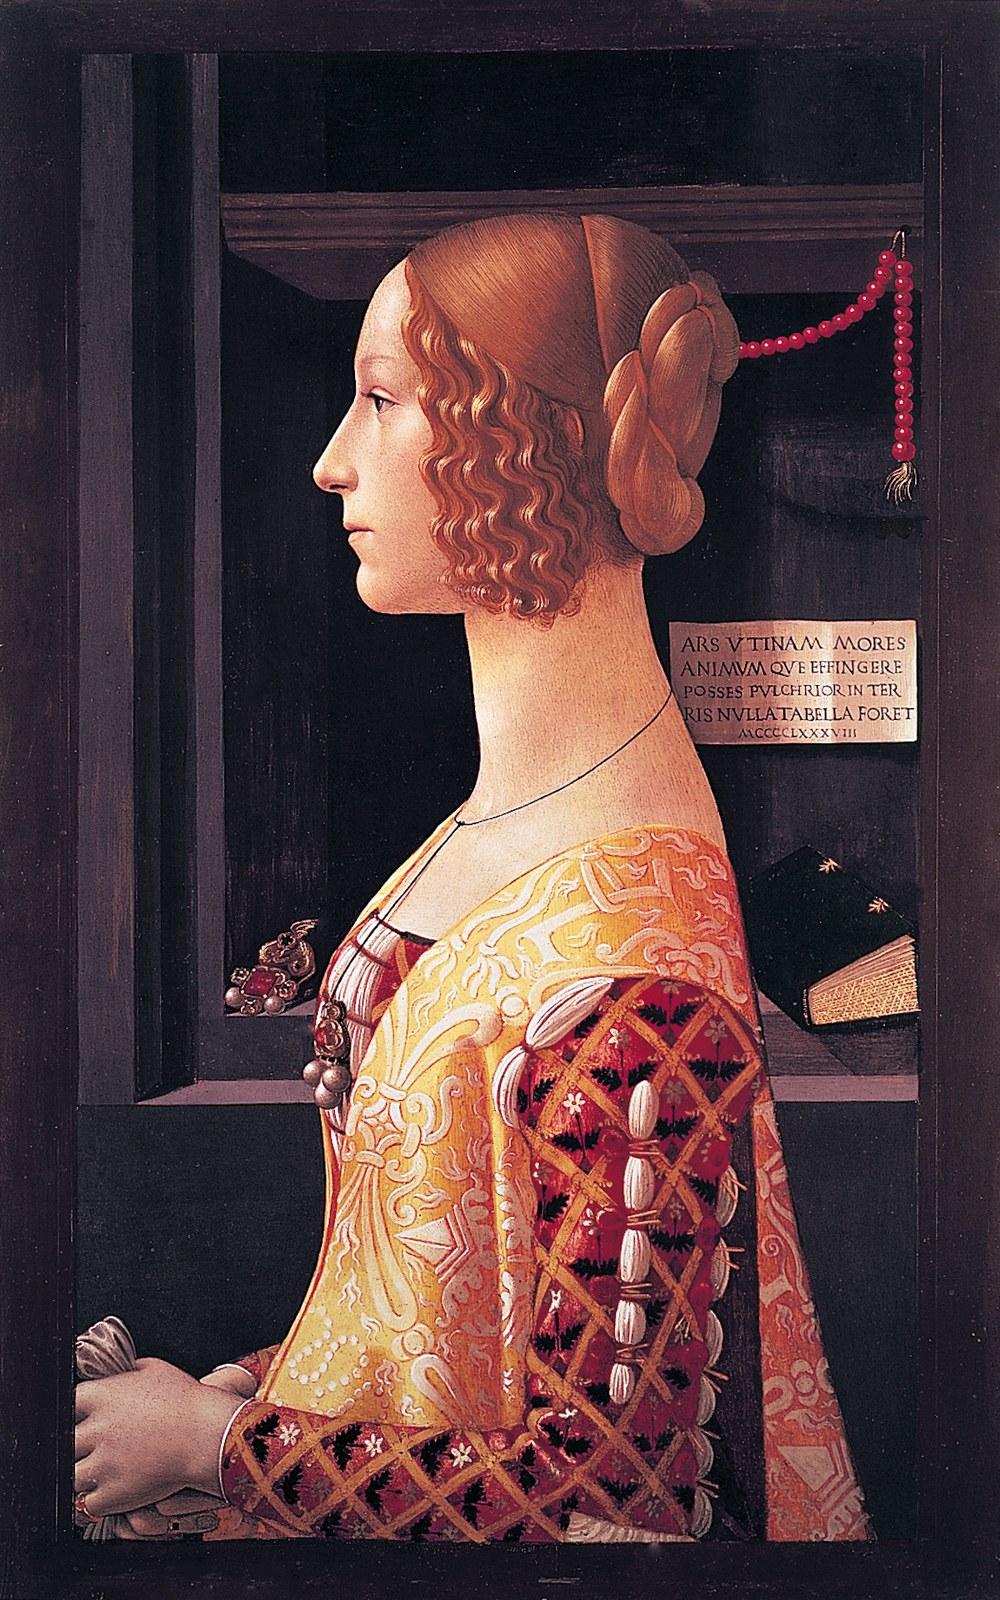 00 Domenico Ghirlandaio. Giovanna Tornabuoni. 1488